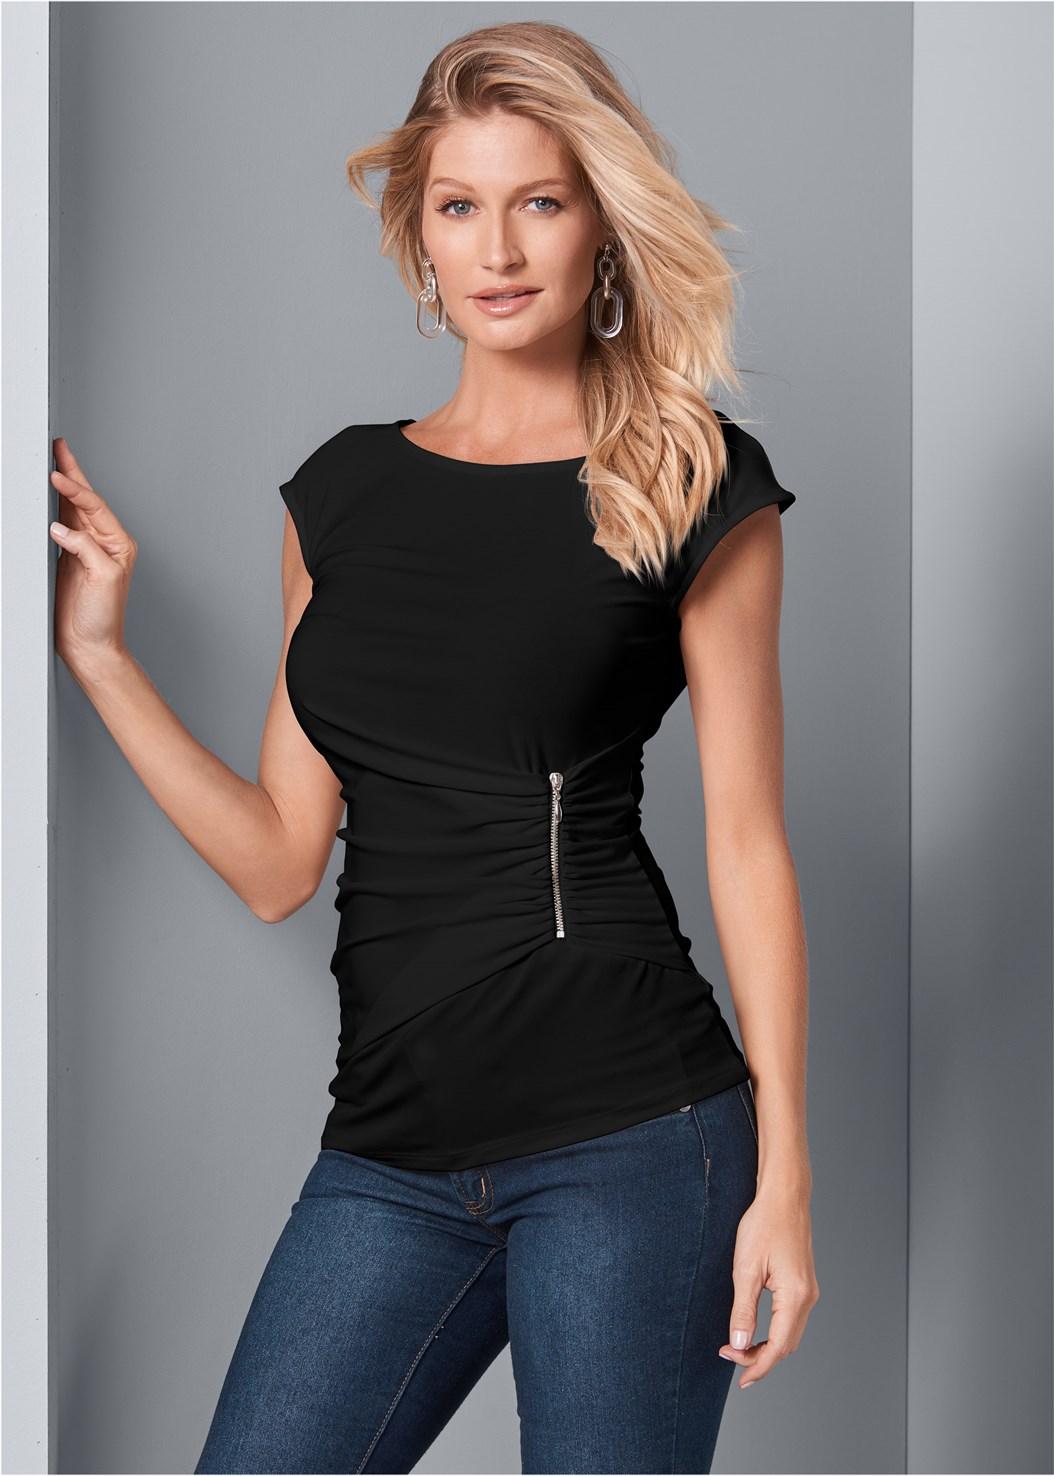 Zip Detail Top,Mid Rise Color Skinny Jeans,Circle Ring Detail Handbag